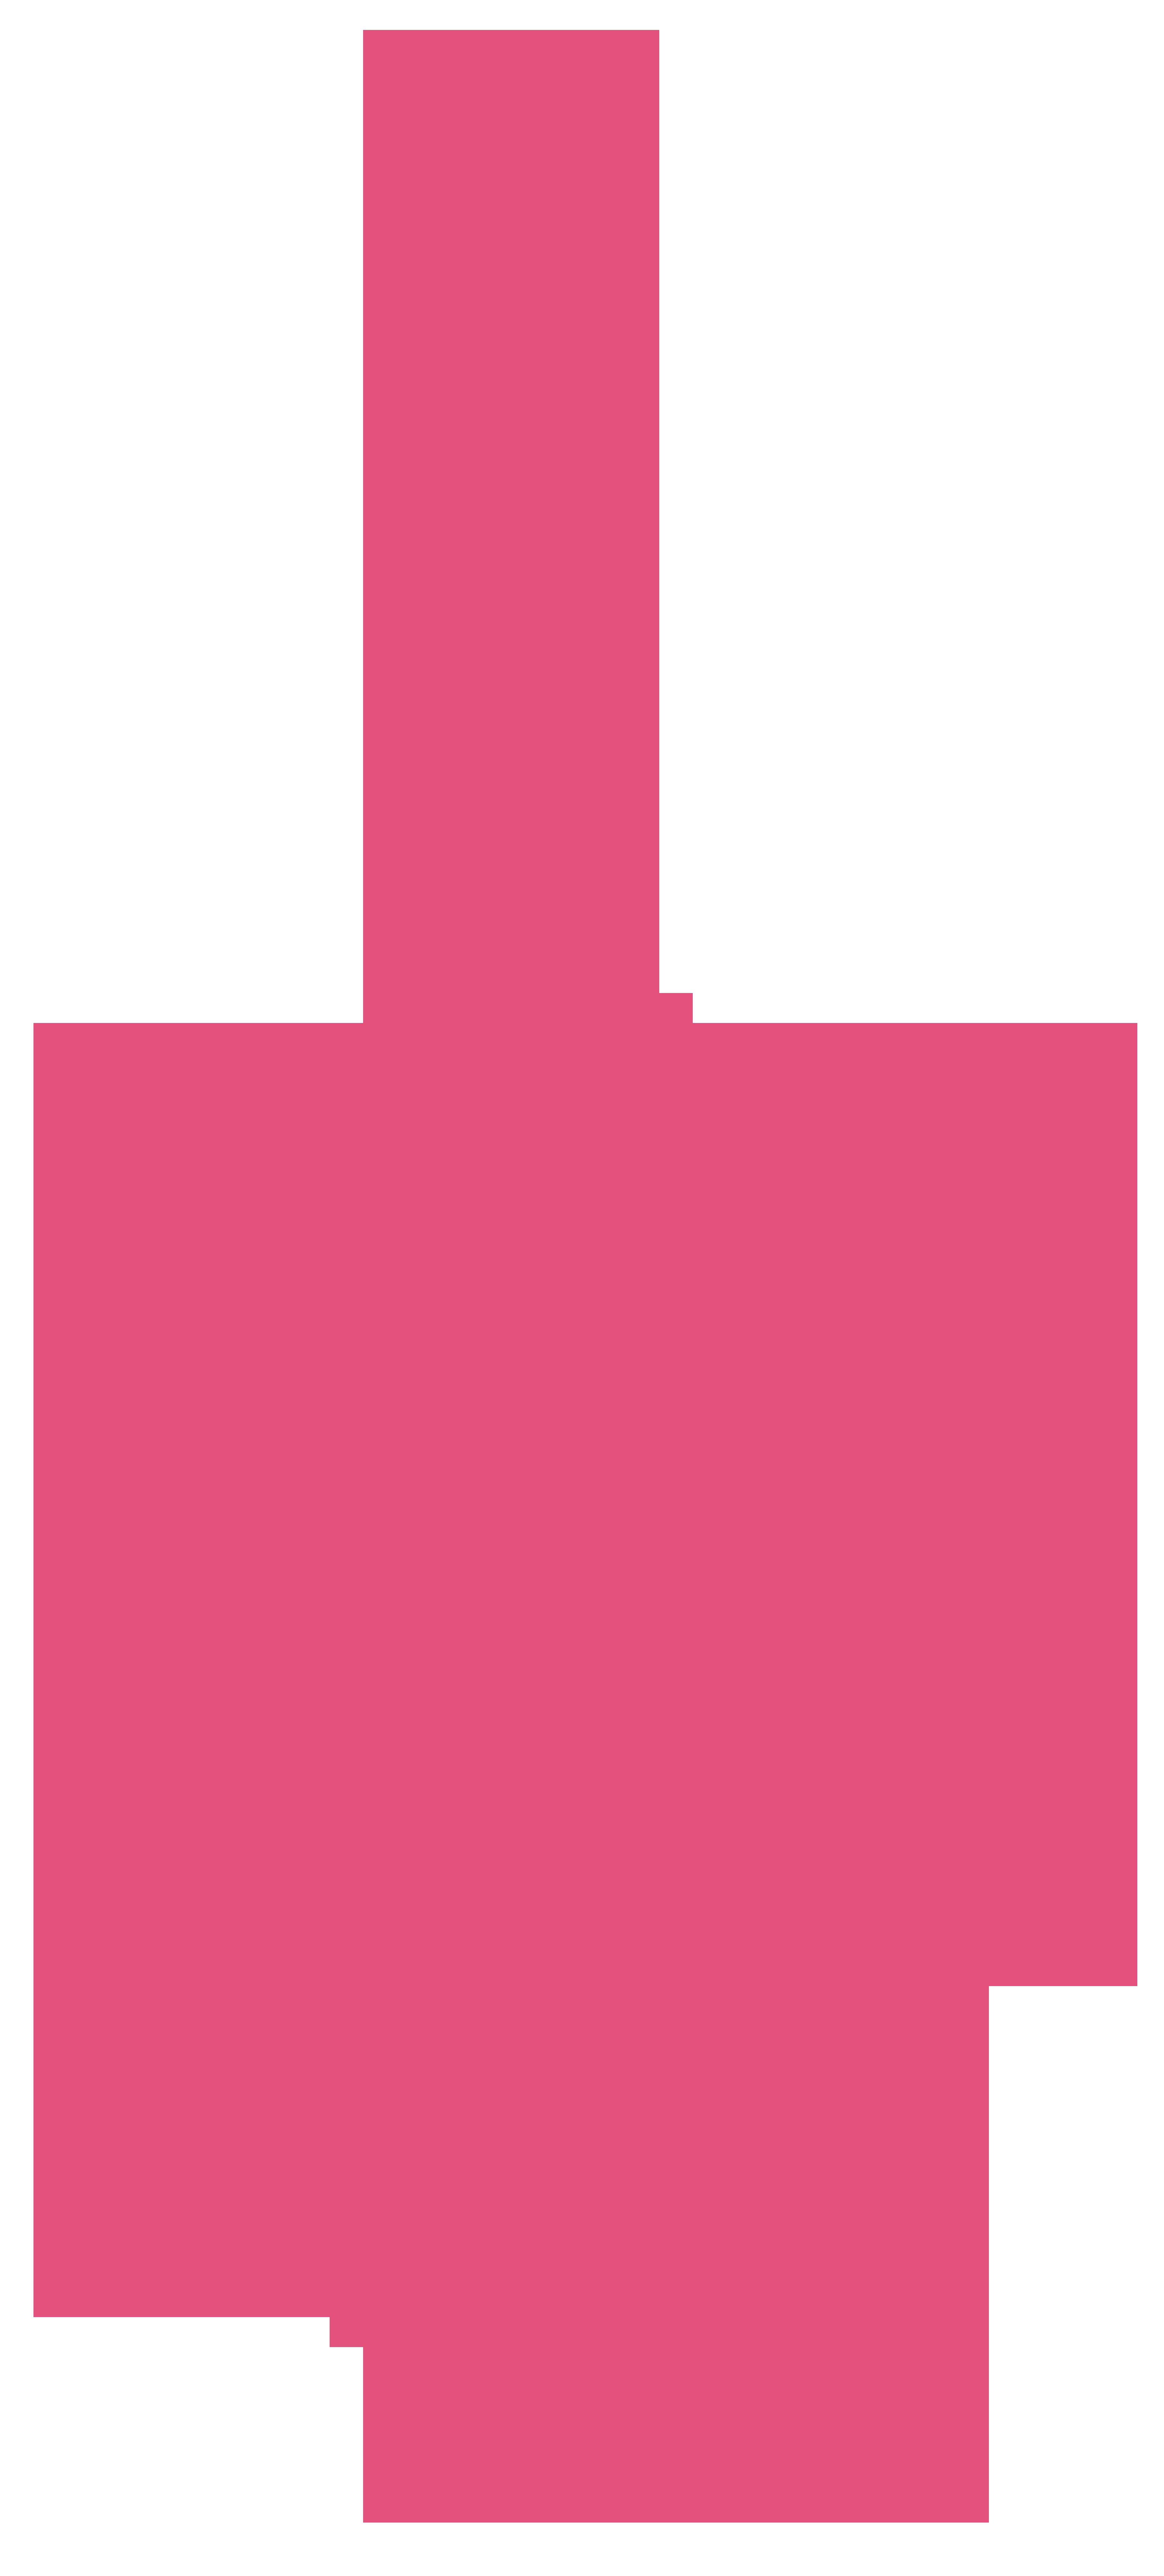 Decorative Heart Transparent PNG Clip Art Image.